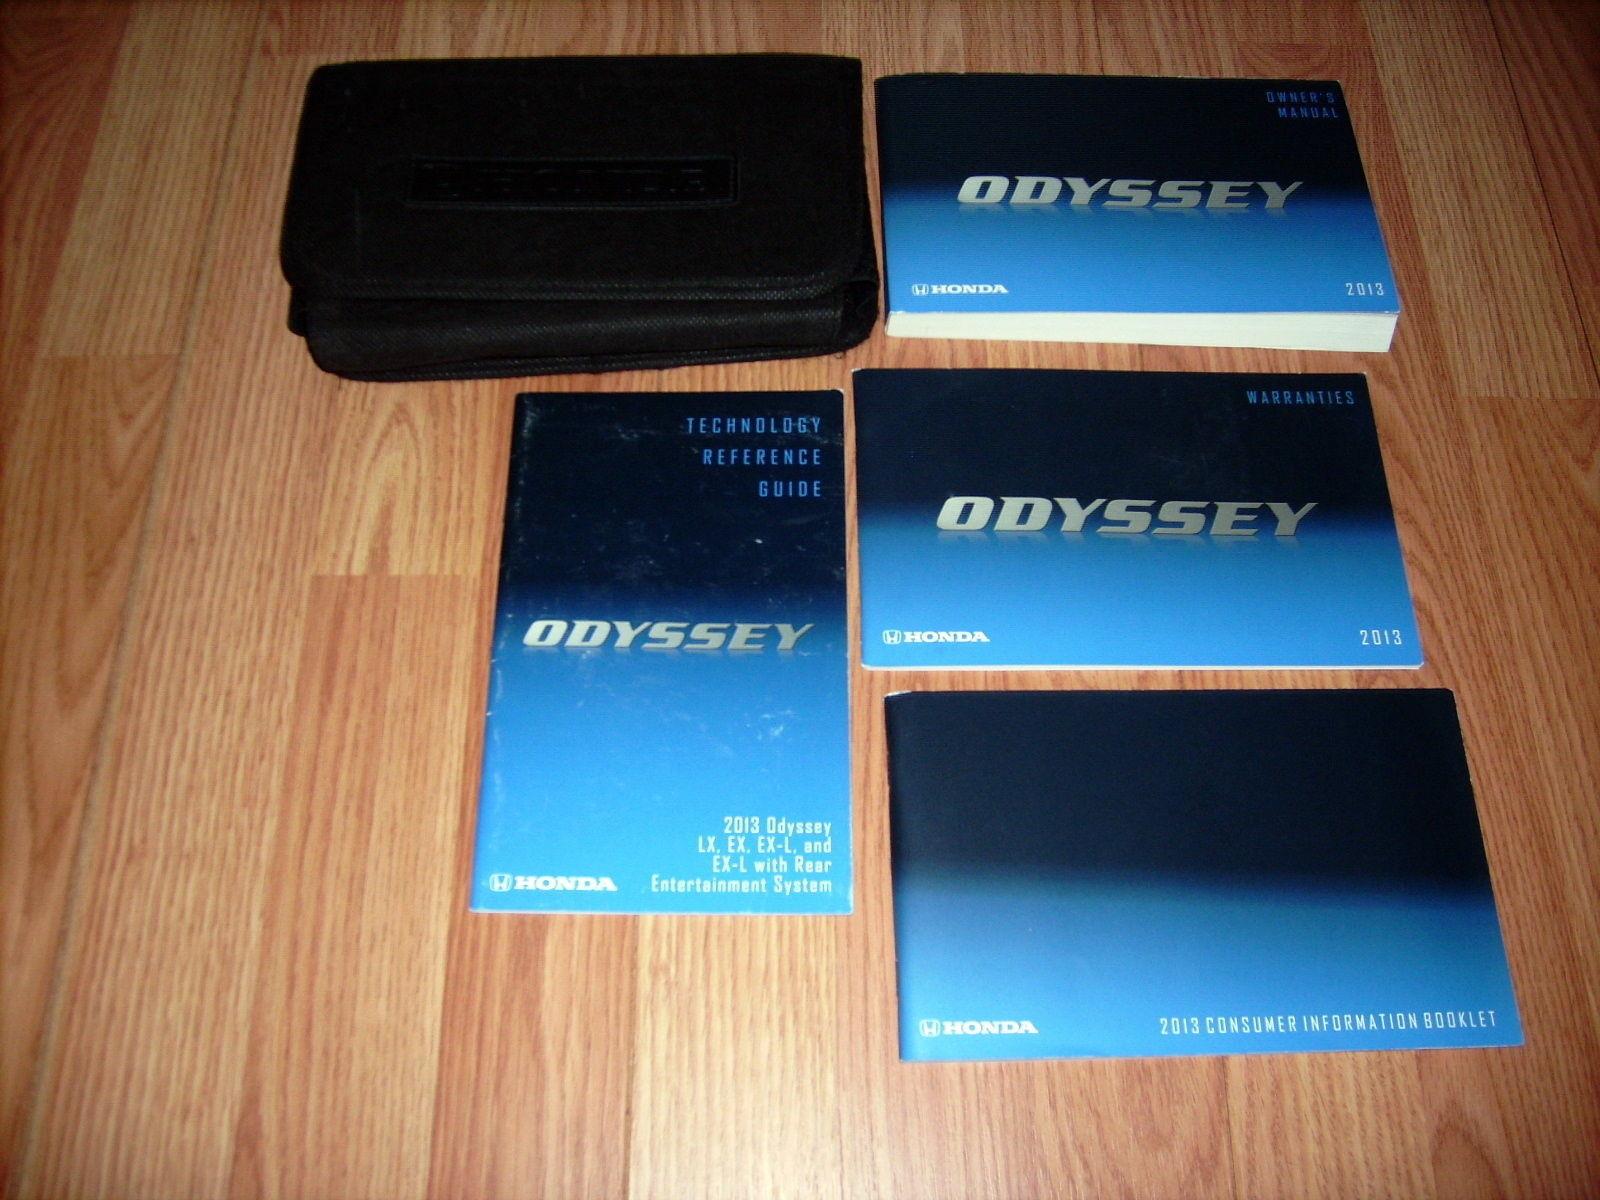 2013 Honda Odyssey Owners Manual 03322 and 50 similar items. S l1600